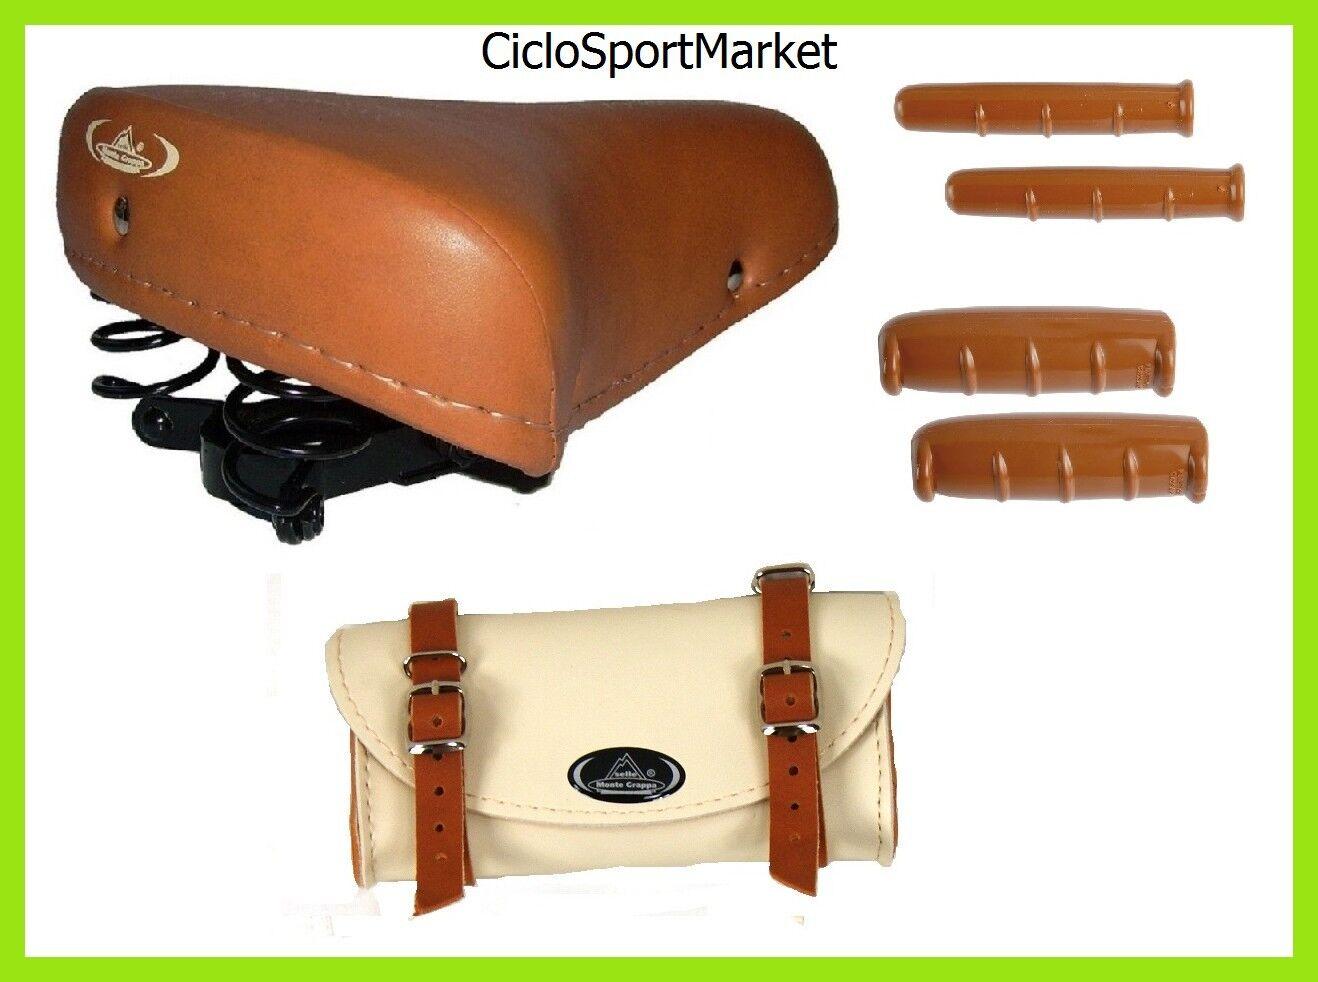 Saddle MONTEGRAPPA with Springs + Bag + Grips + grips Brake Bike